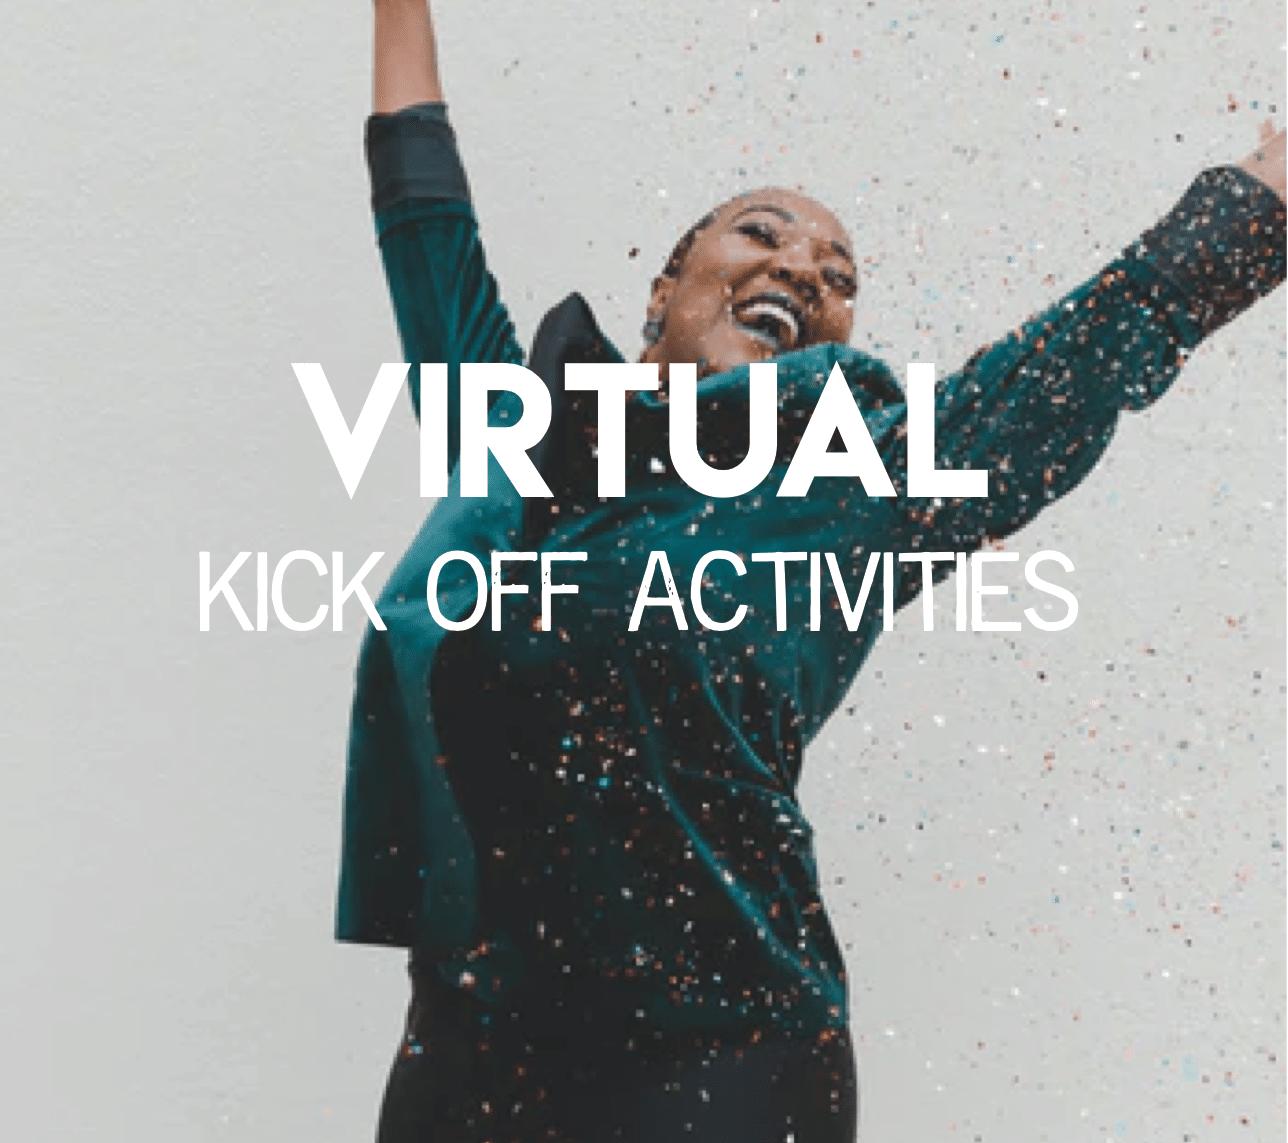 Virtual Kick Off Activities